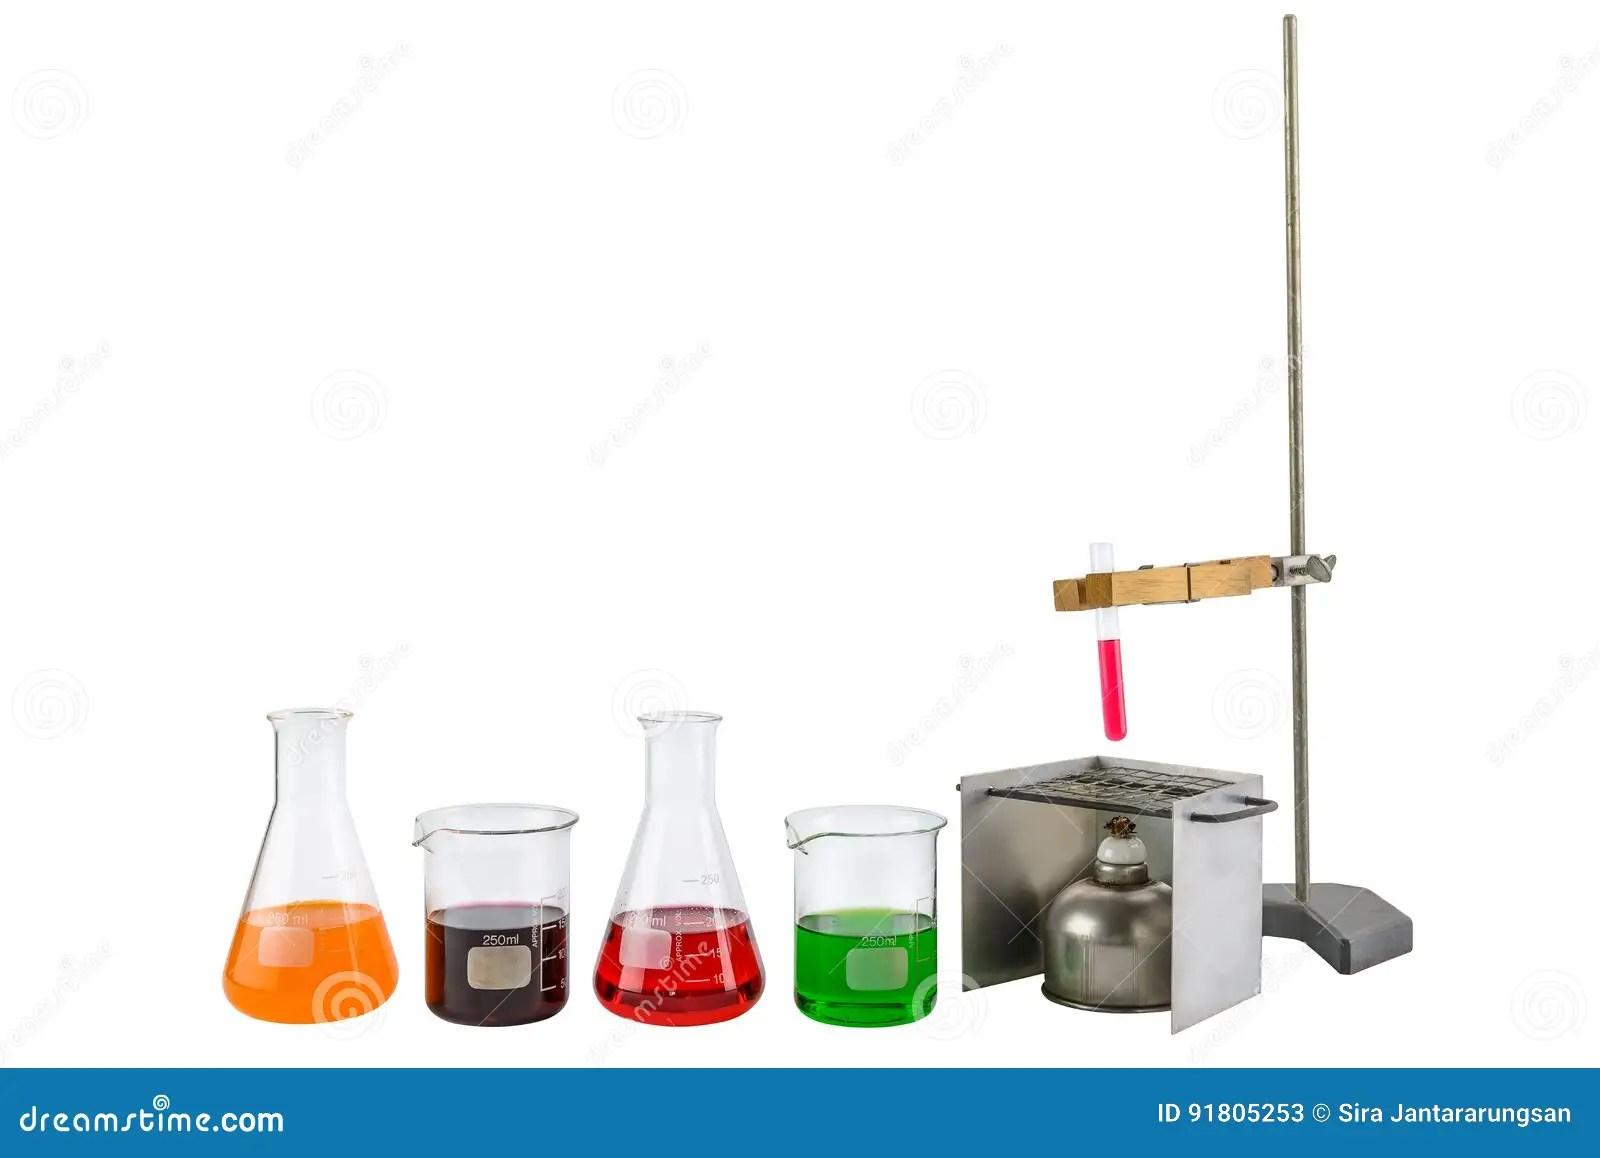 Laboratory Equipment Test Tube Holder And Alcohol Lamp Test Tub Stock Image